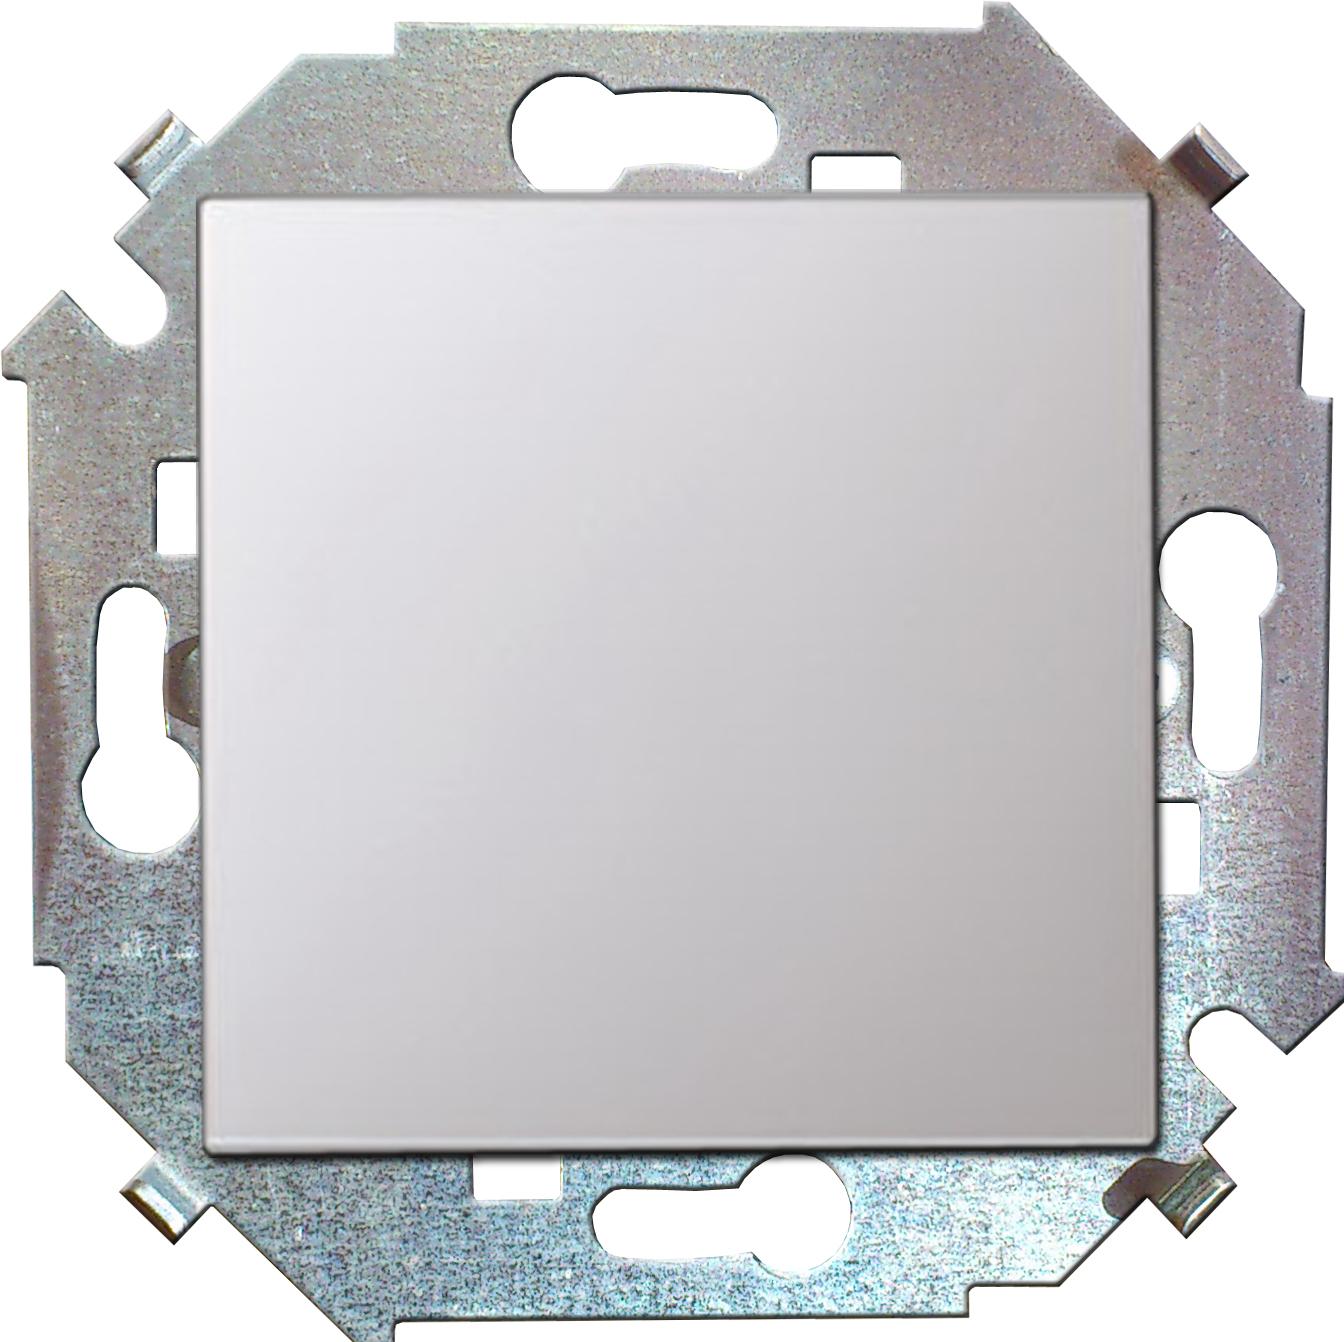 Переключатель Simon 15 1591201-030 simon simon15 aqua белый переключатель 1 клавишный с п наружный ip54 1594204 030